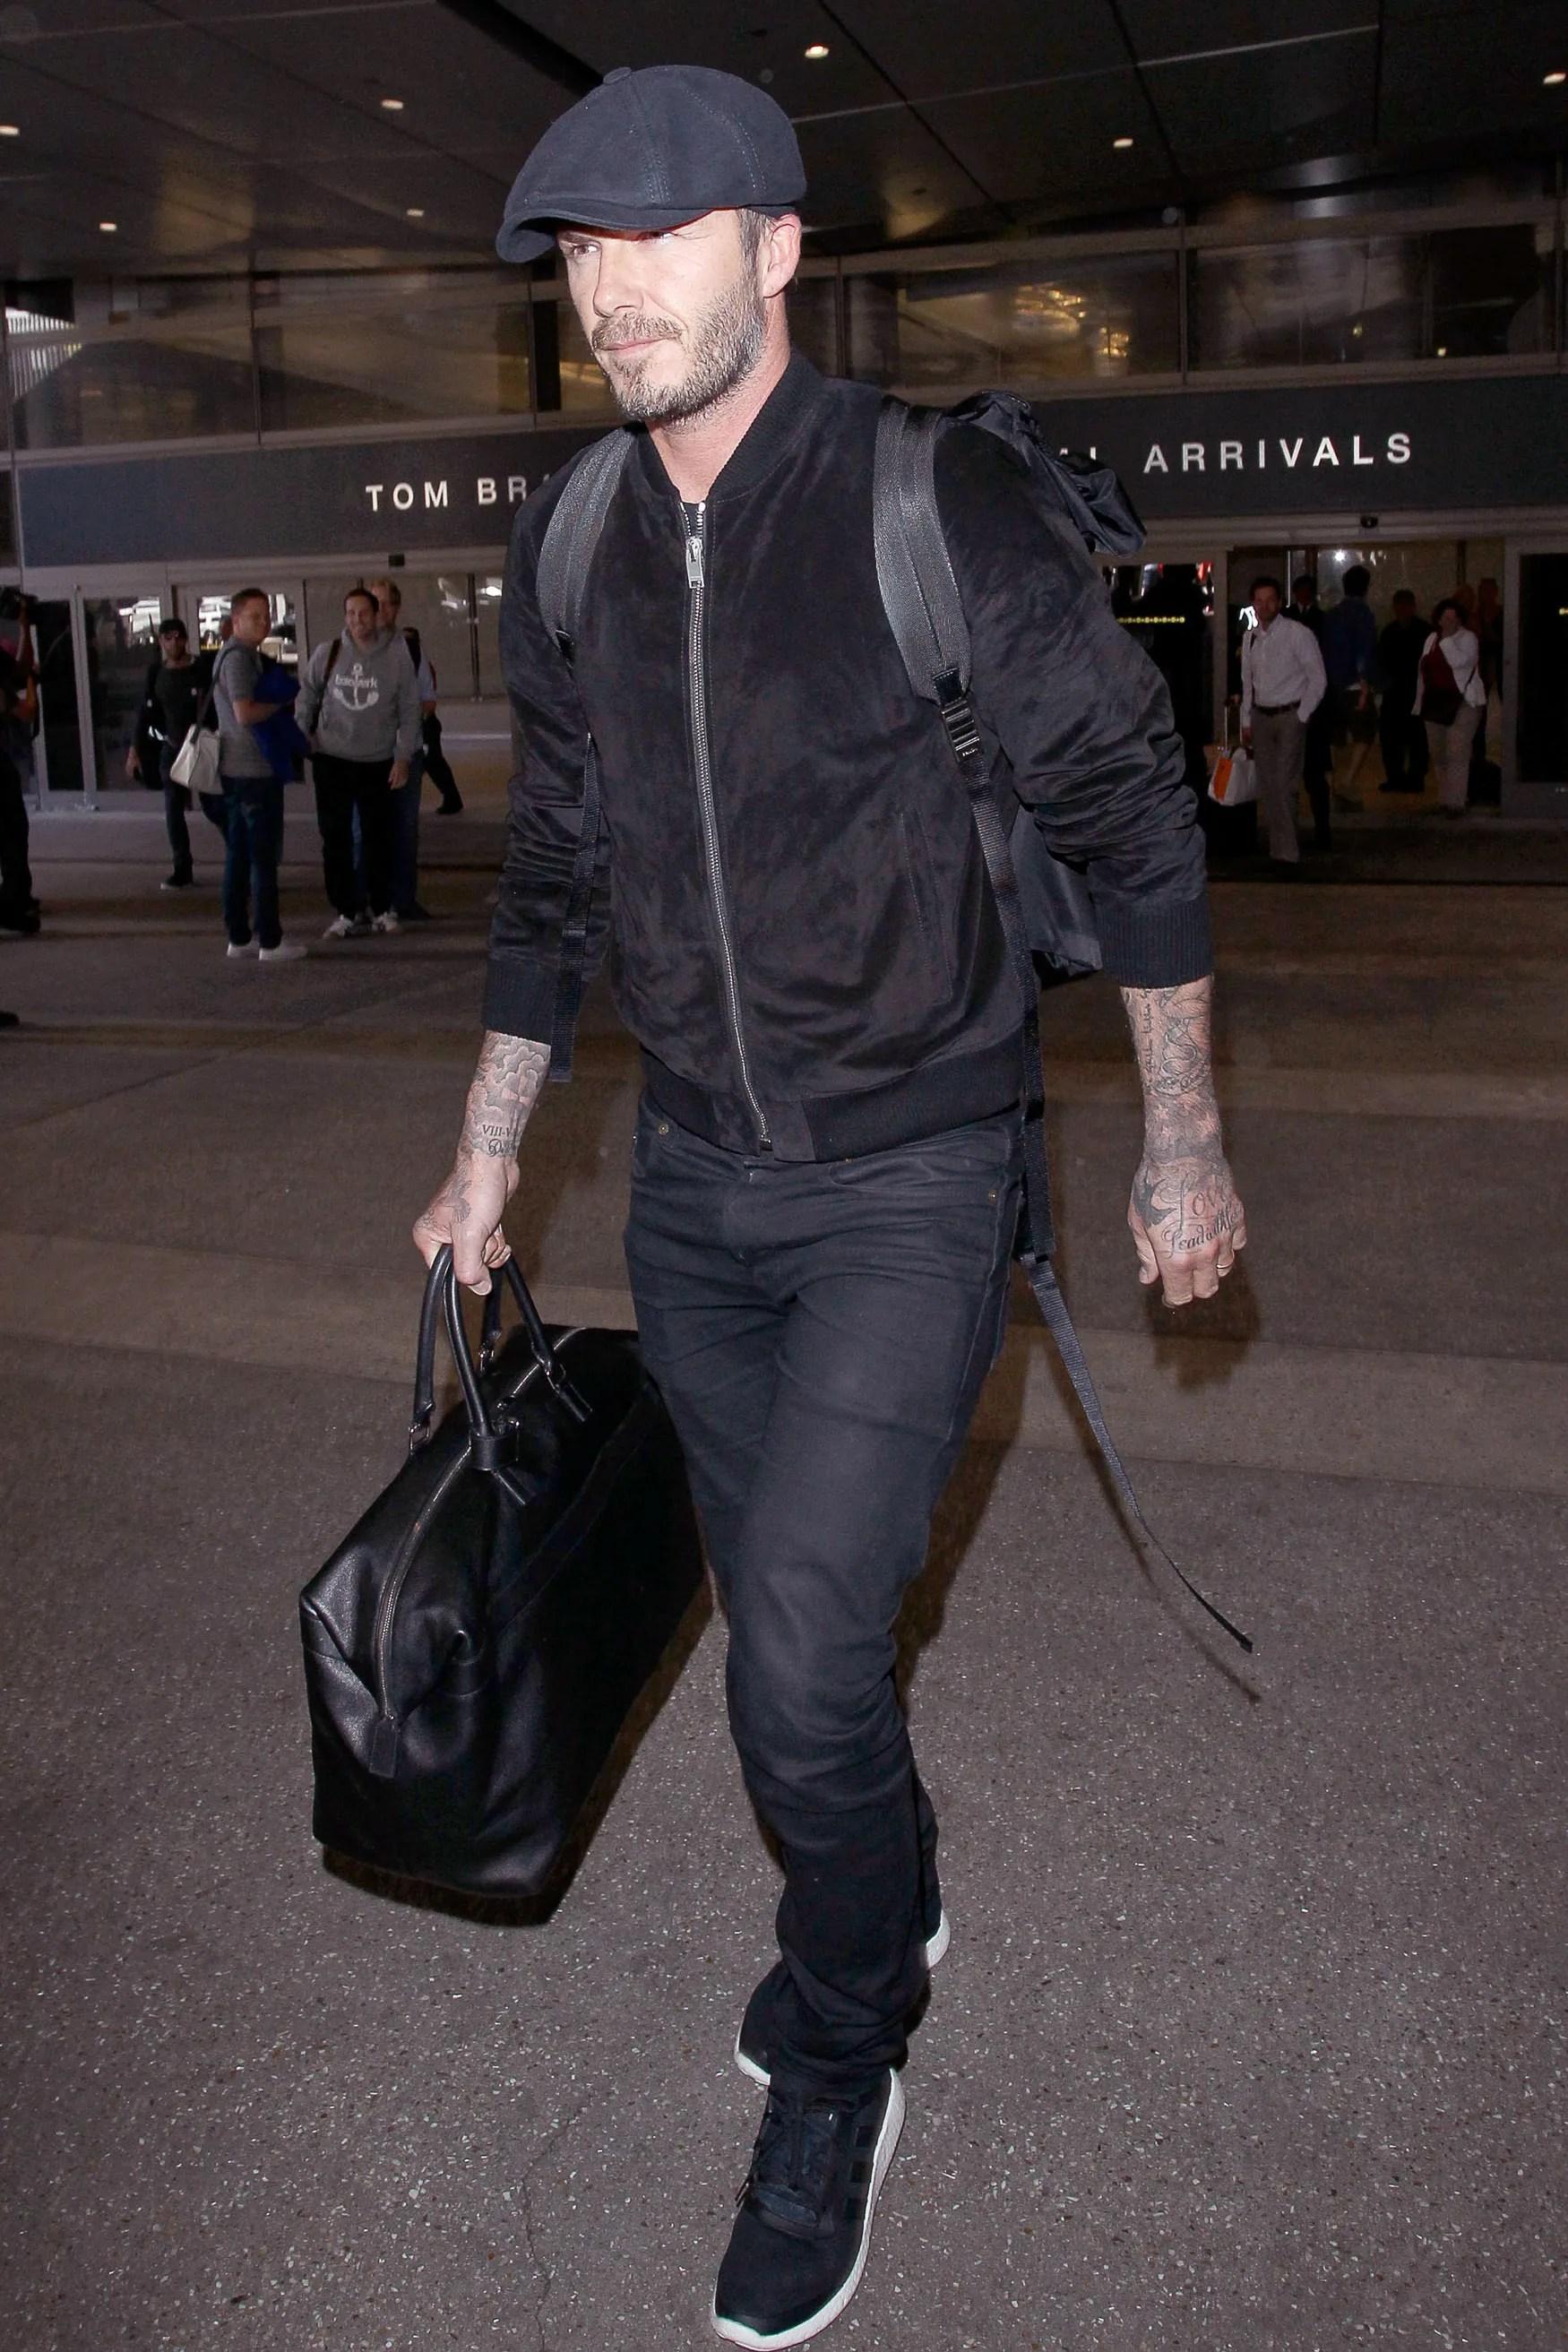 Match scheduled for may 19, 2021. The David Beckham Look Book Photos | GQ